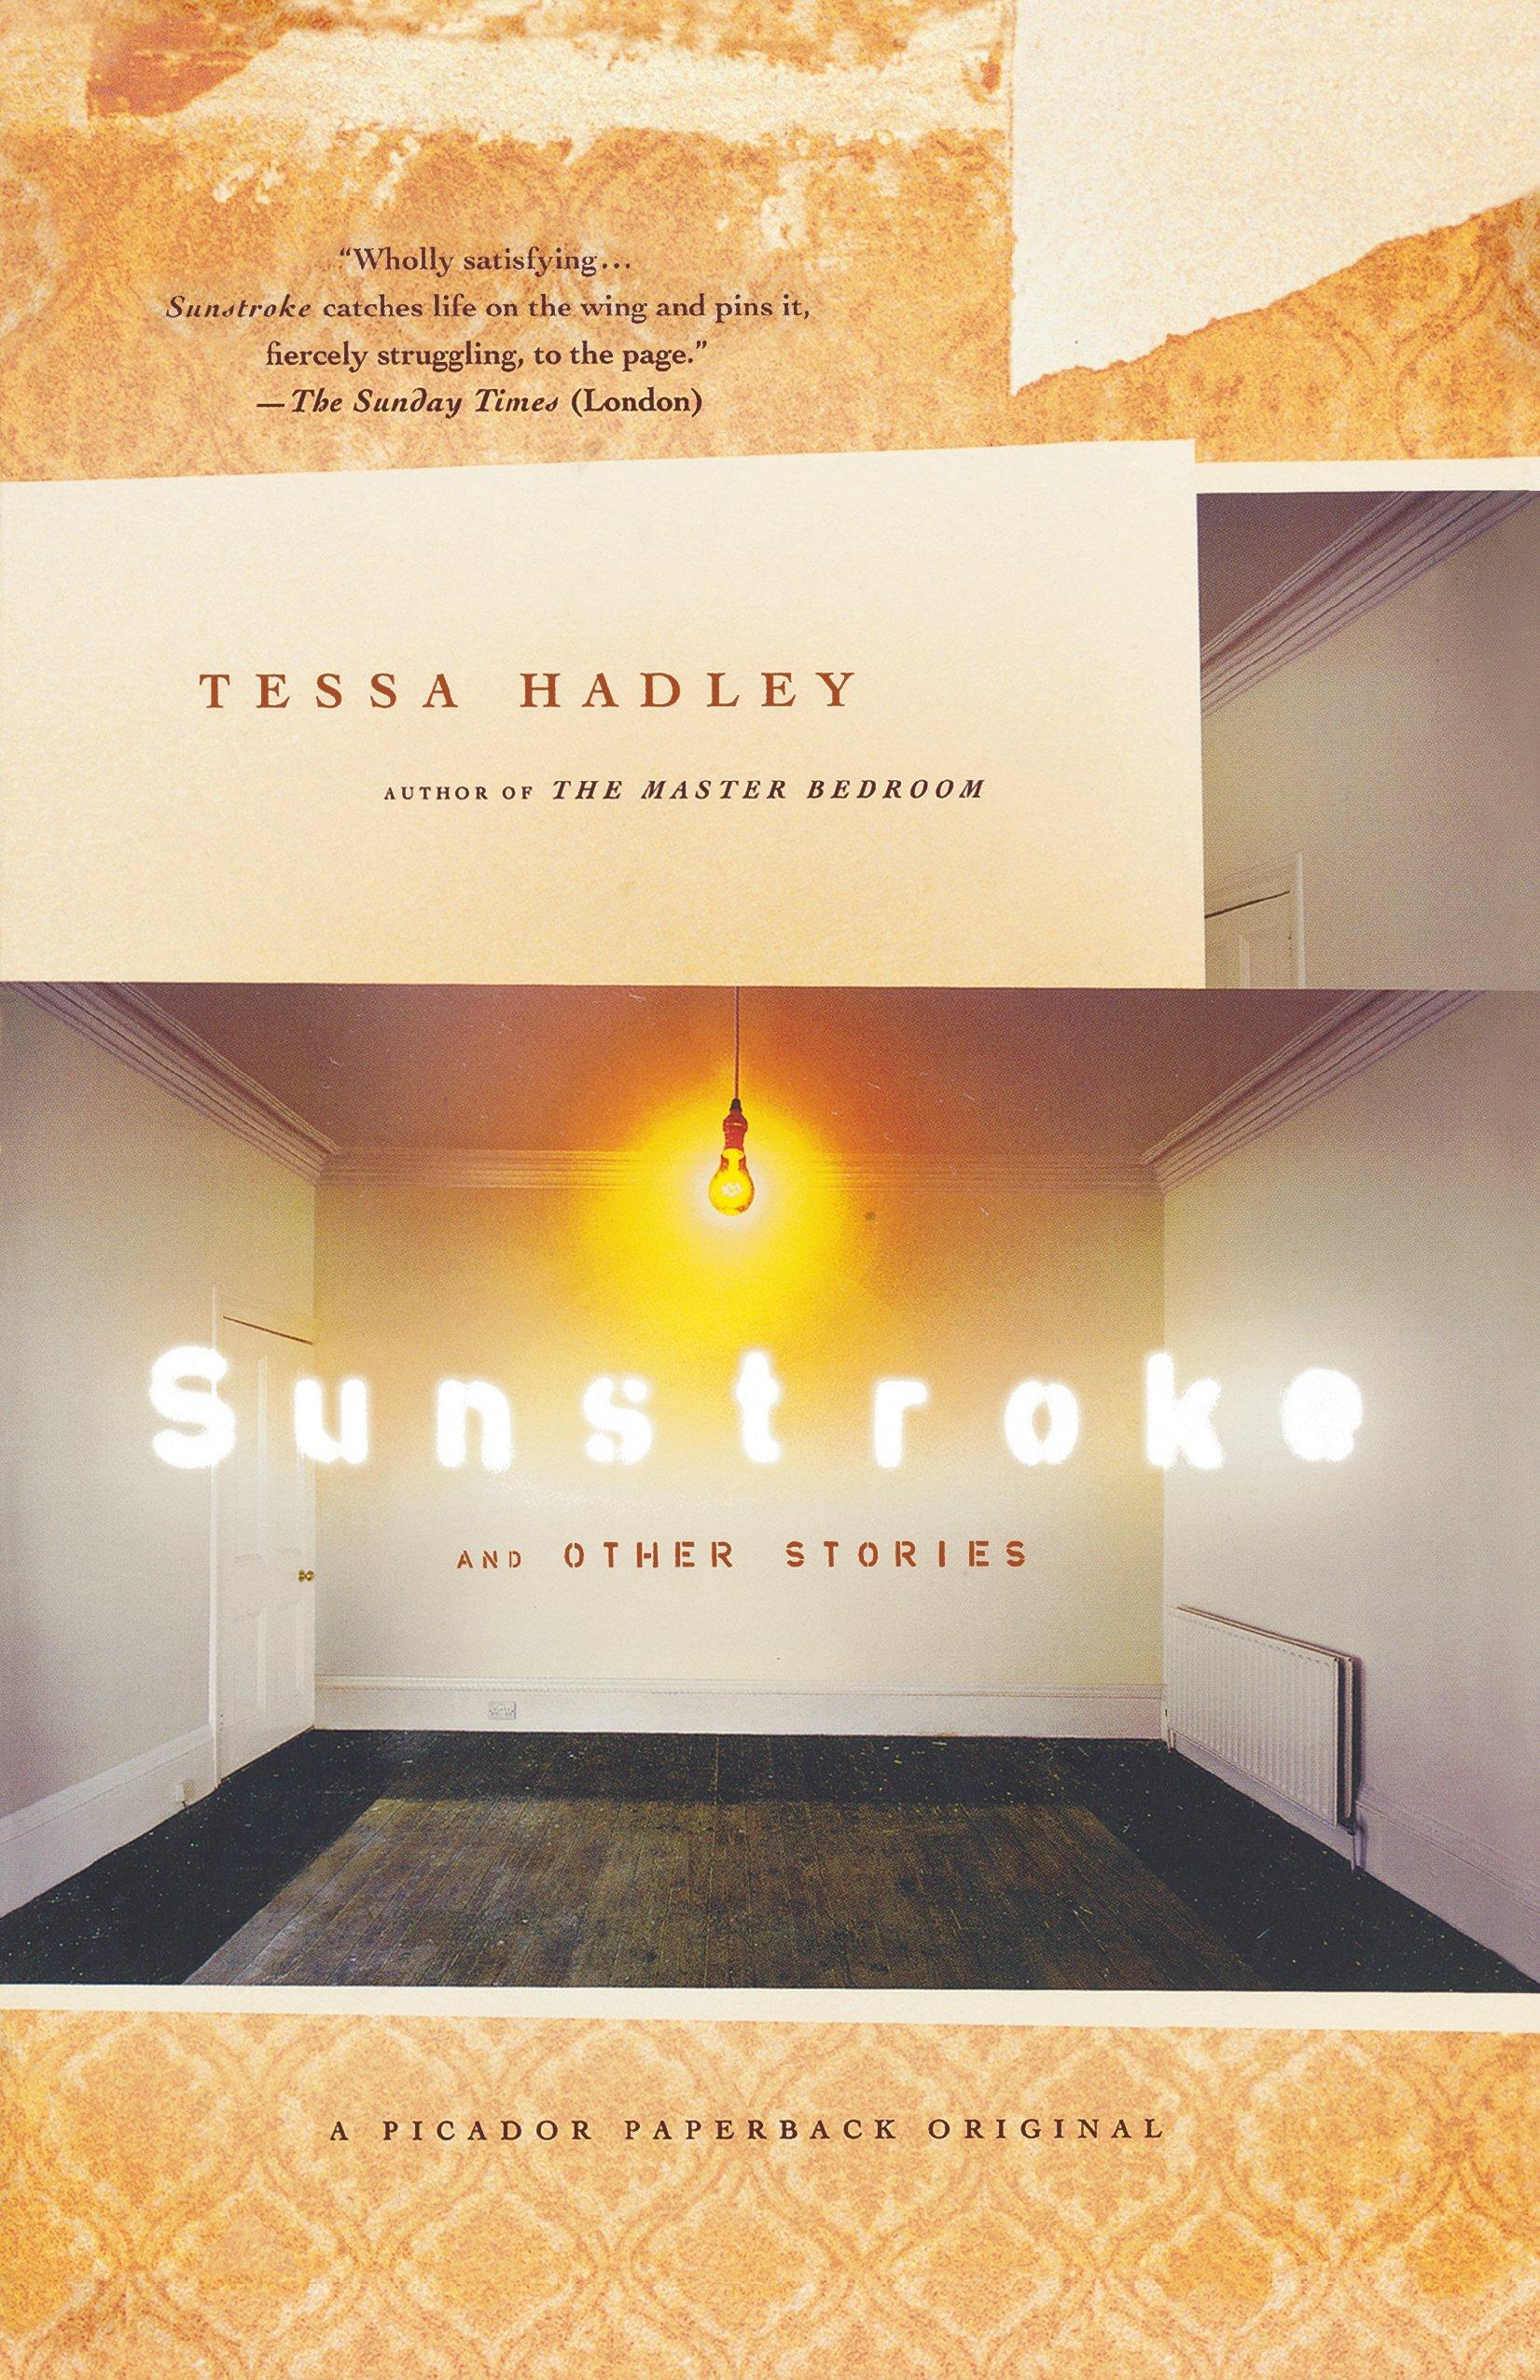 Sunstroke Selected Stories